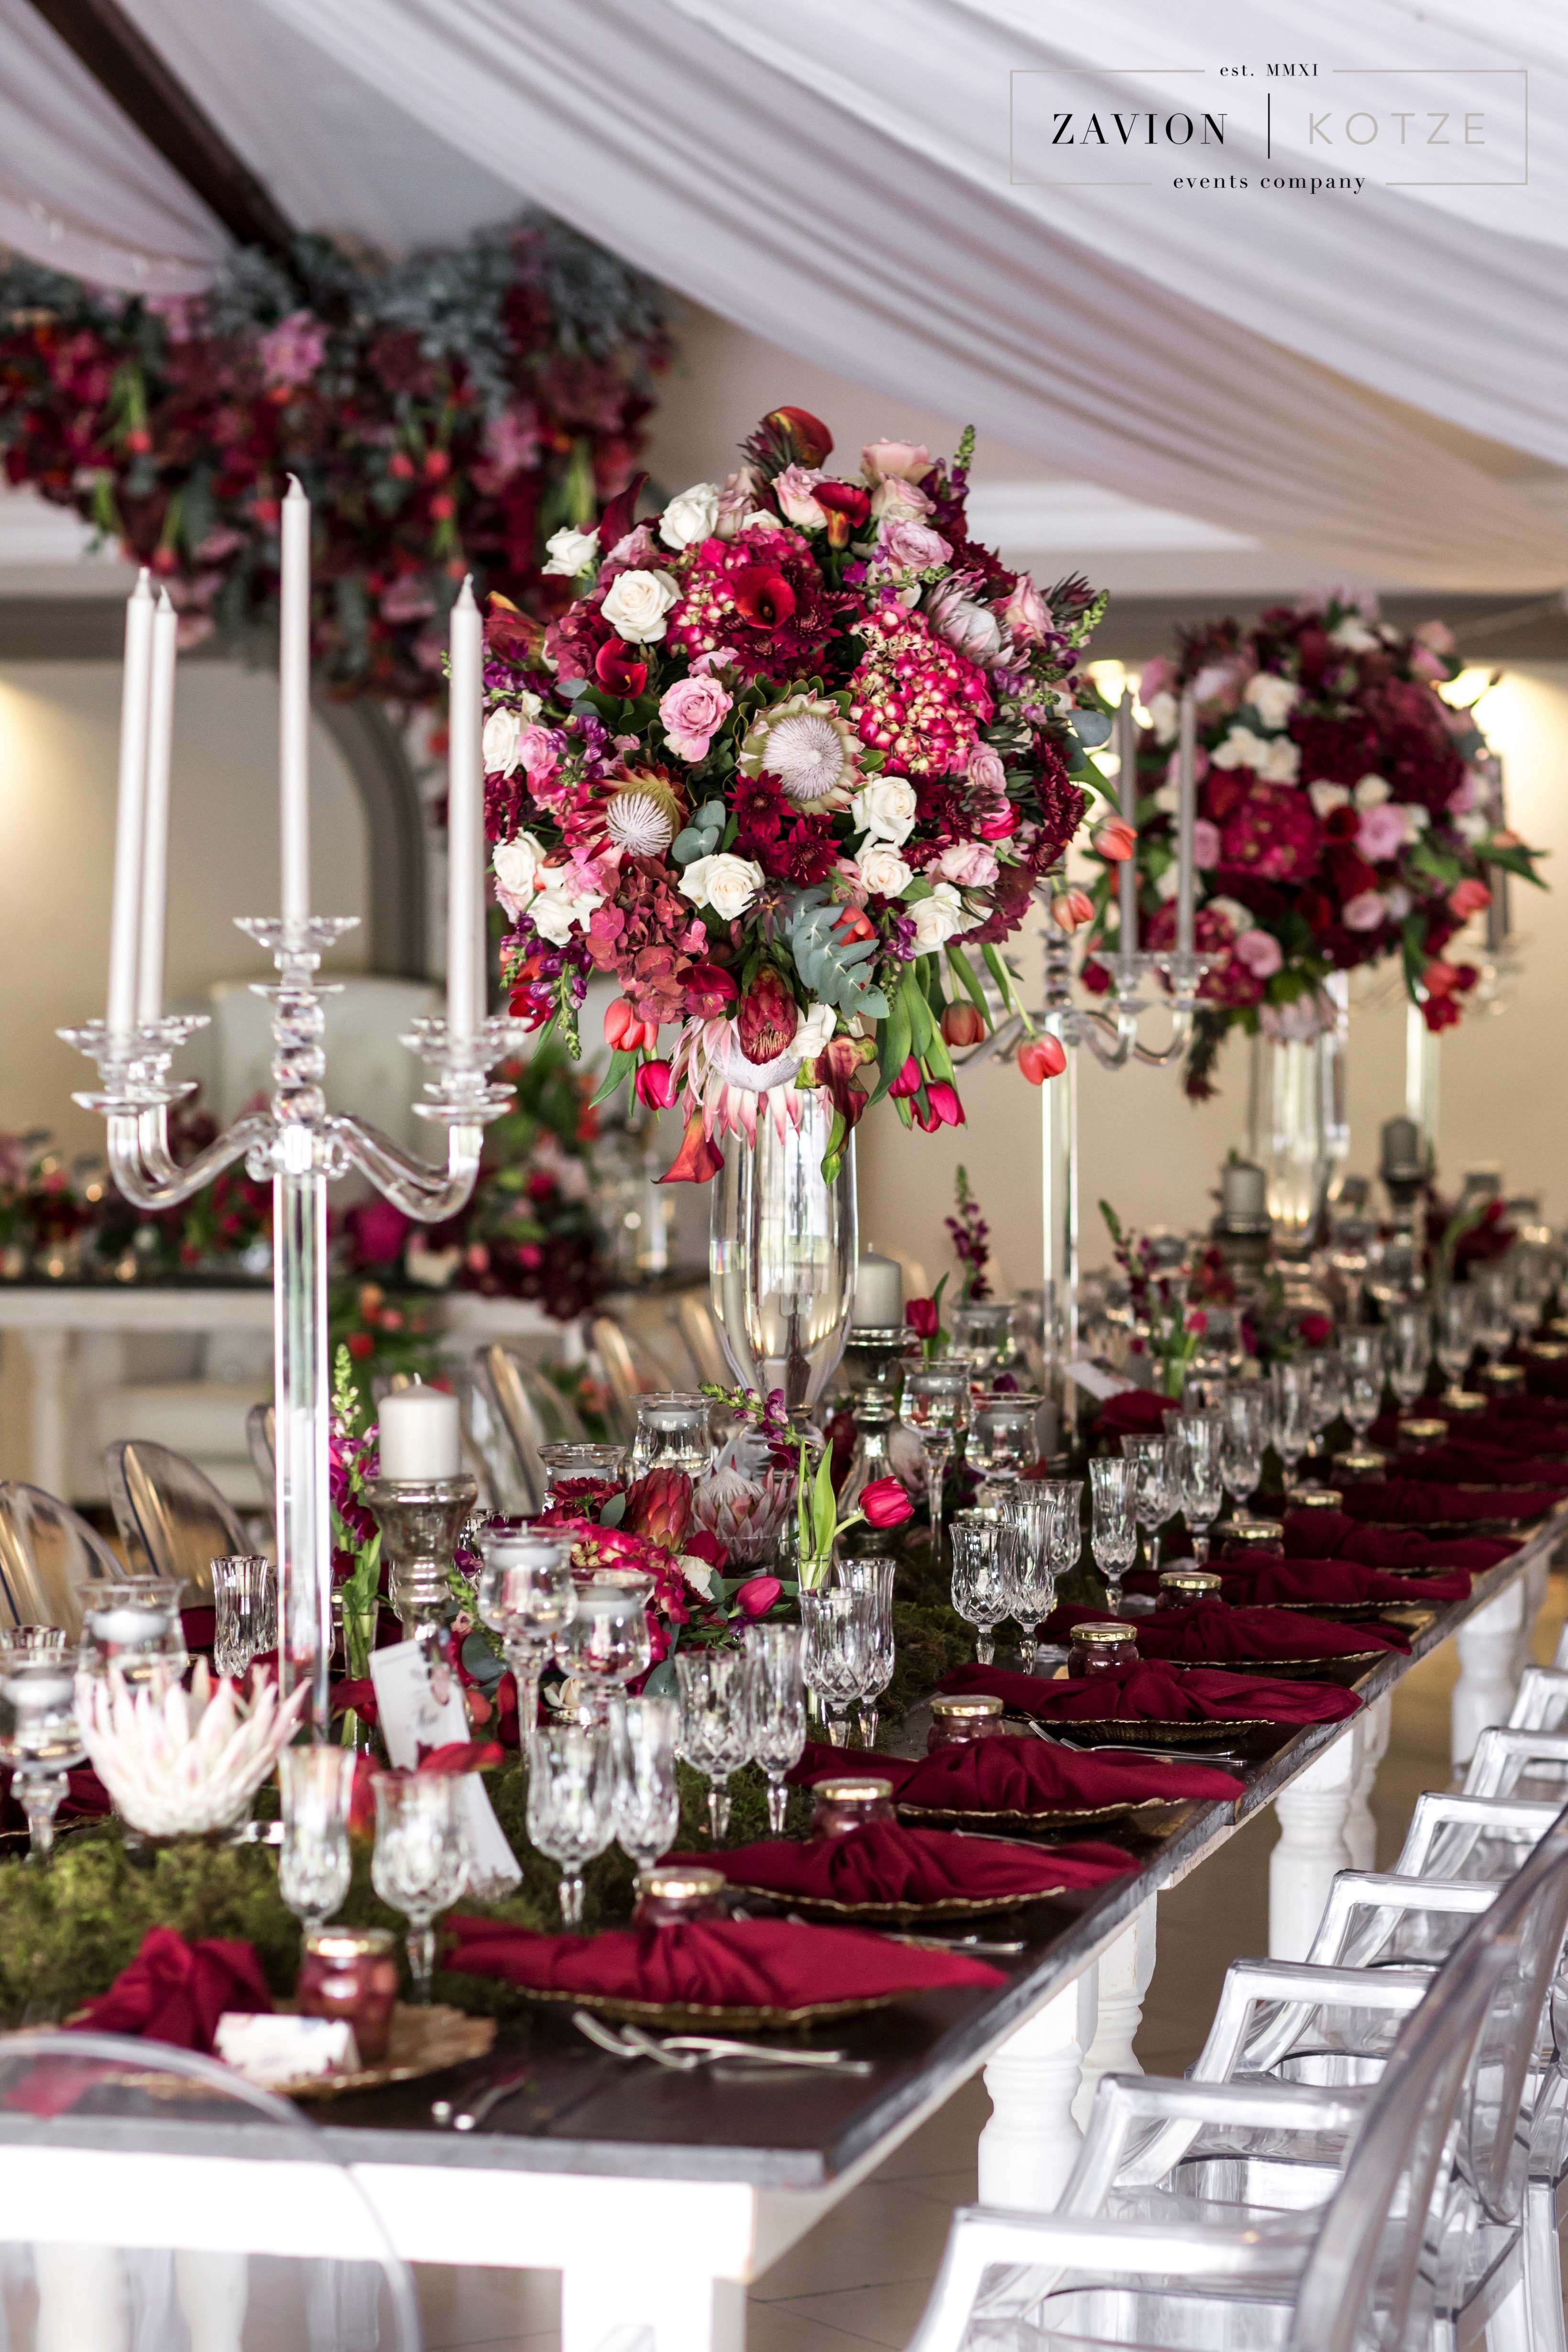 flower vase design of wedding decoration list elegant diy home decor vaseh vases within wedding decoration list awesome marsala wedding flowers marsala wedding color marsala wedding of wedding decoration list